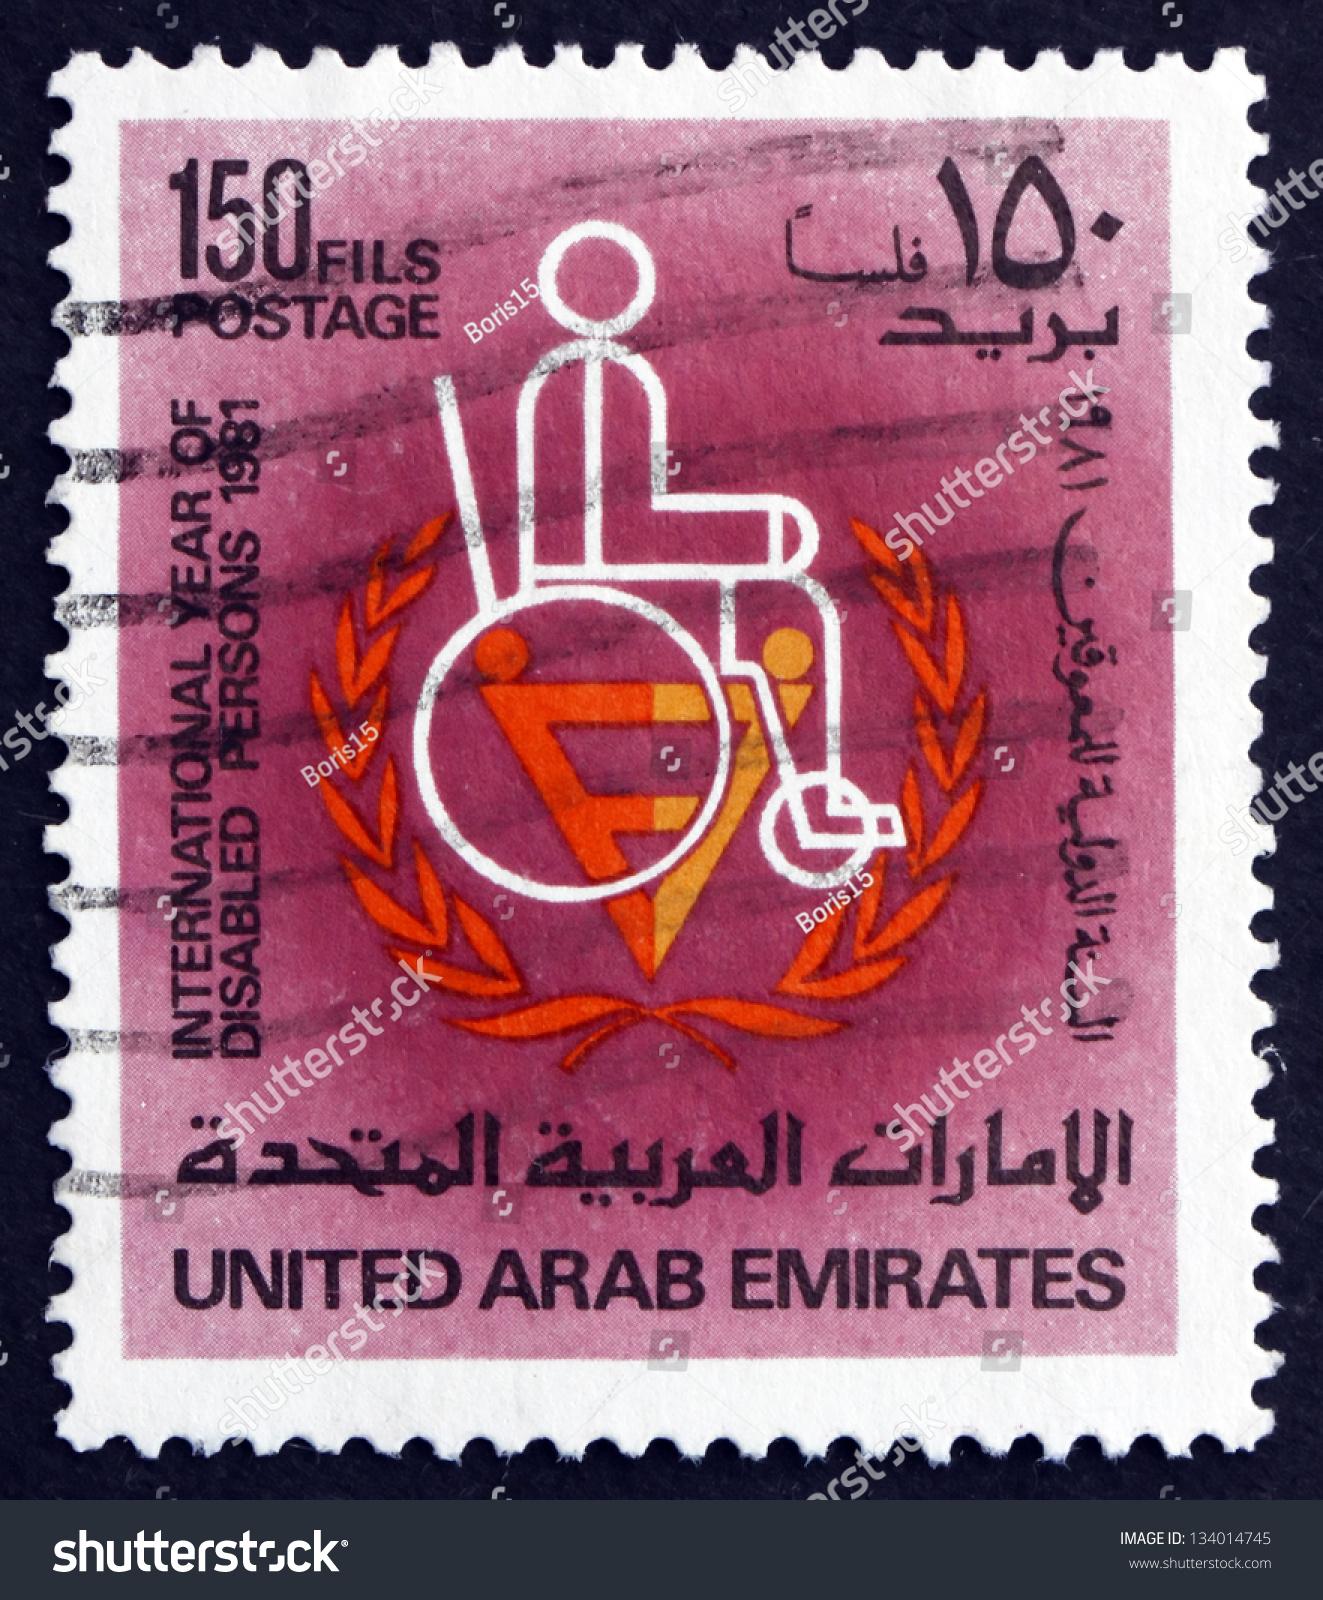 wheelchair emirates teak rocking chair united arab circa 1981 a stamp printed in the